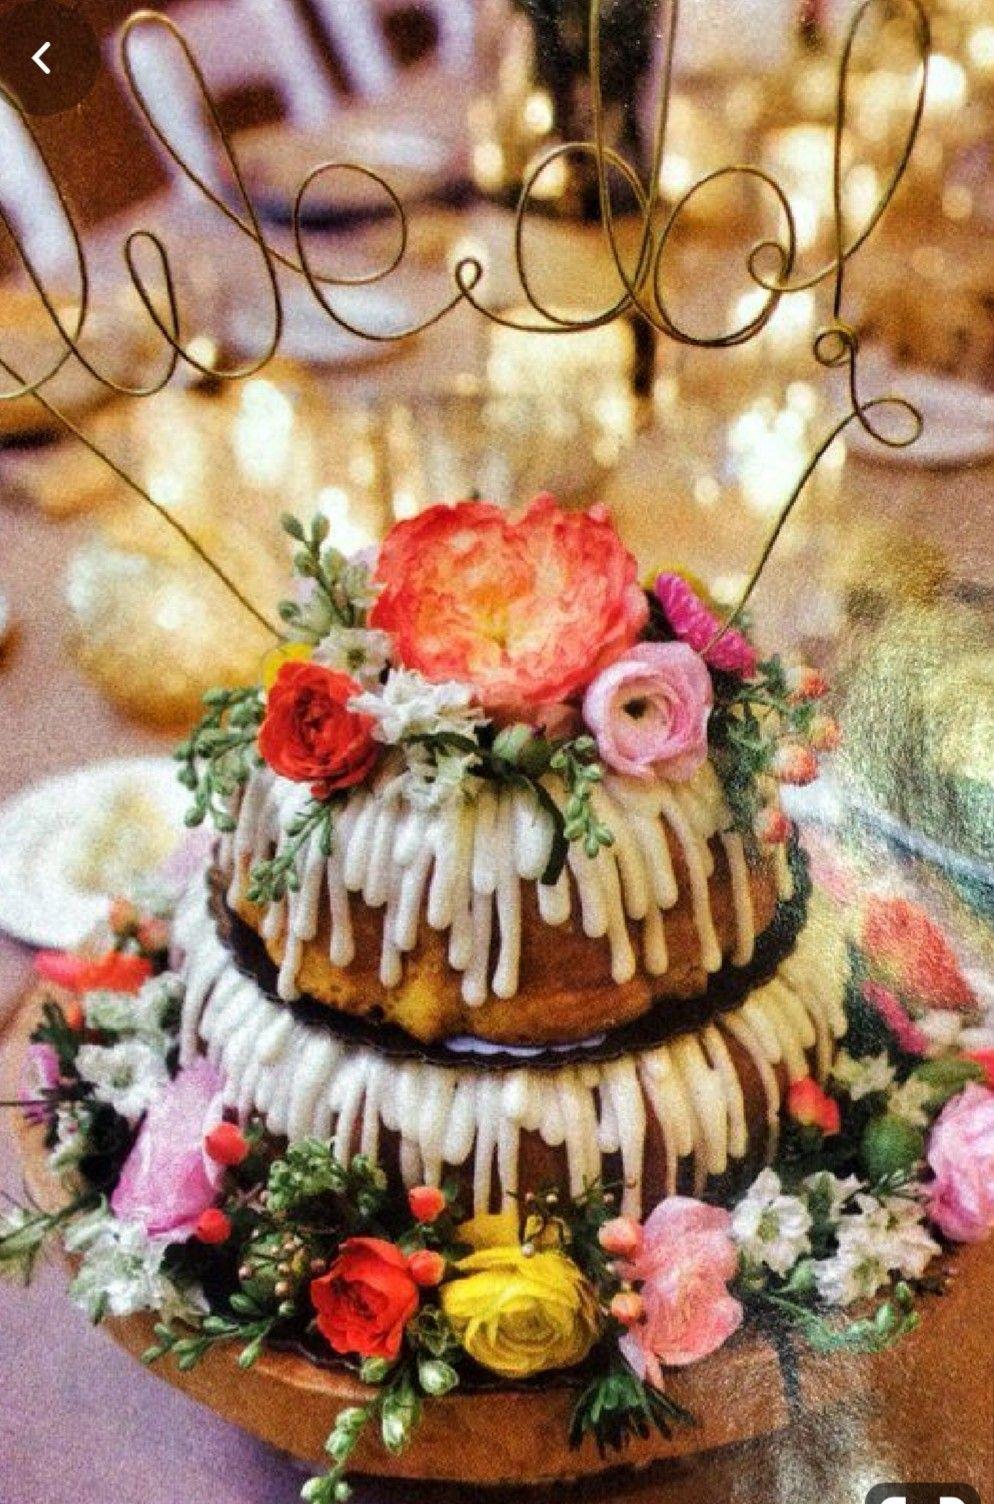 Pin by caren walkup on cakes cupcakesdoughnuts in 2020